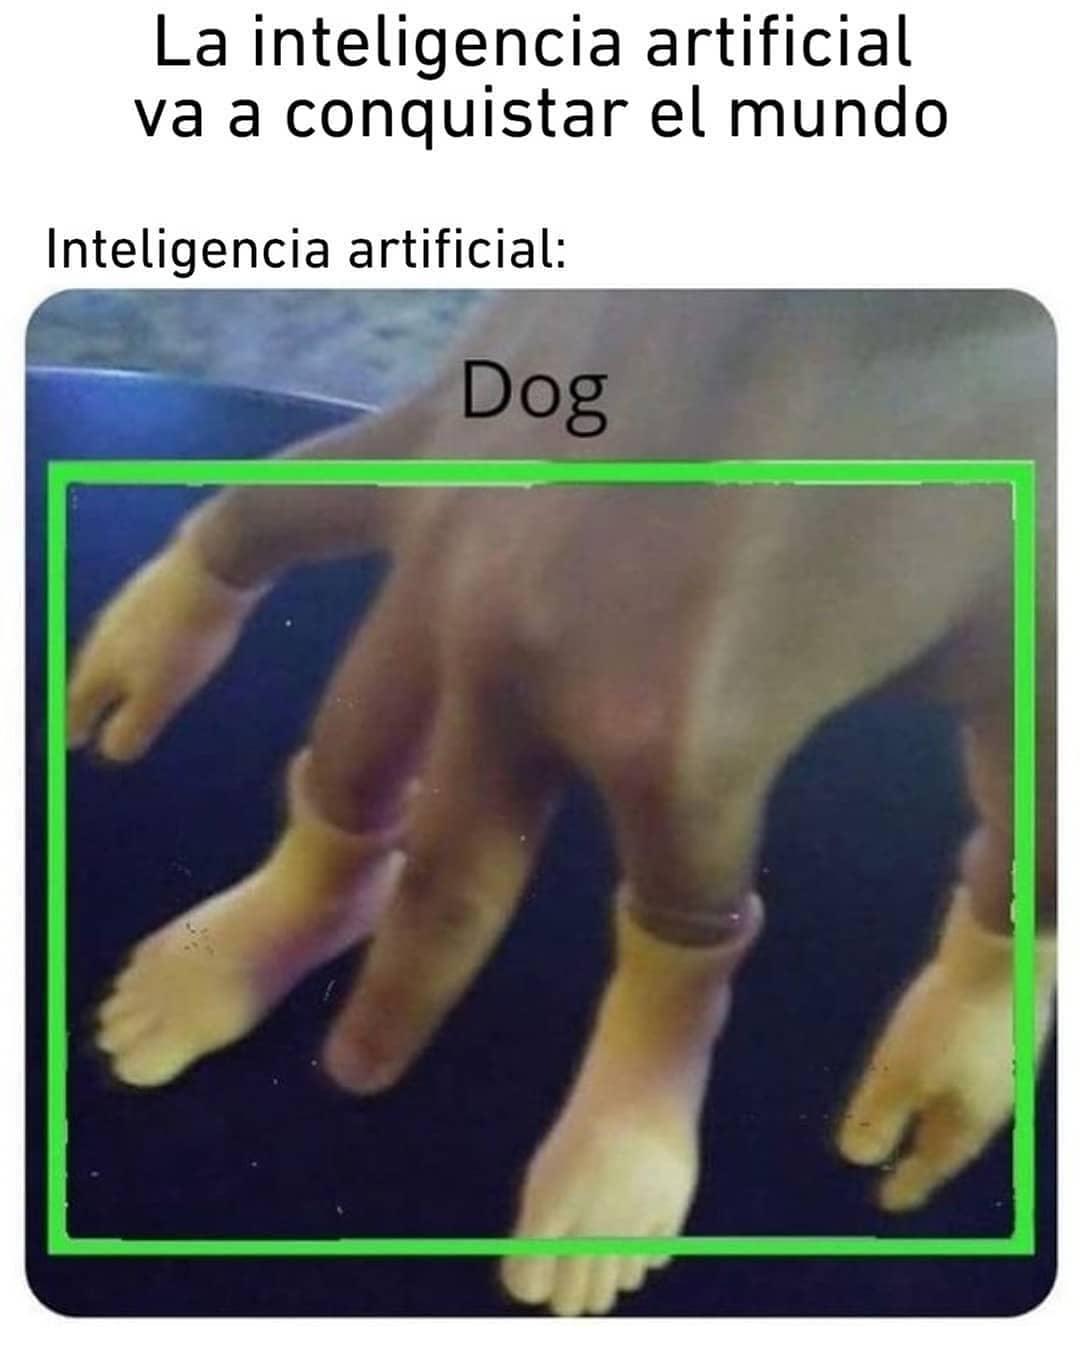 La inteligencia artificial va a conquistar el mundo.  Inteligencia artificial: Dog.